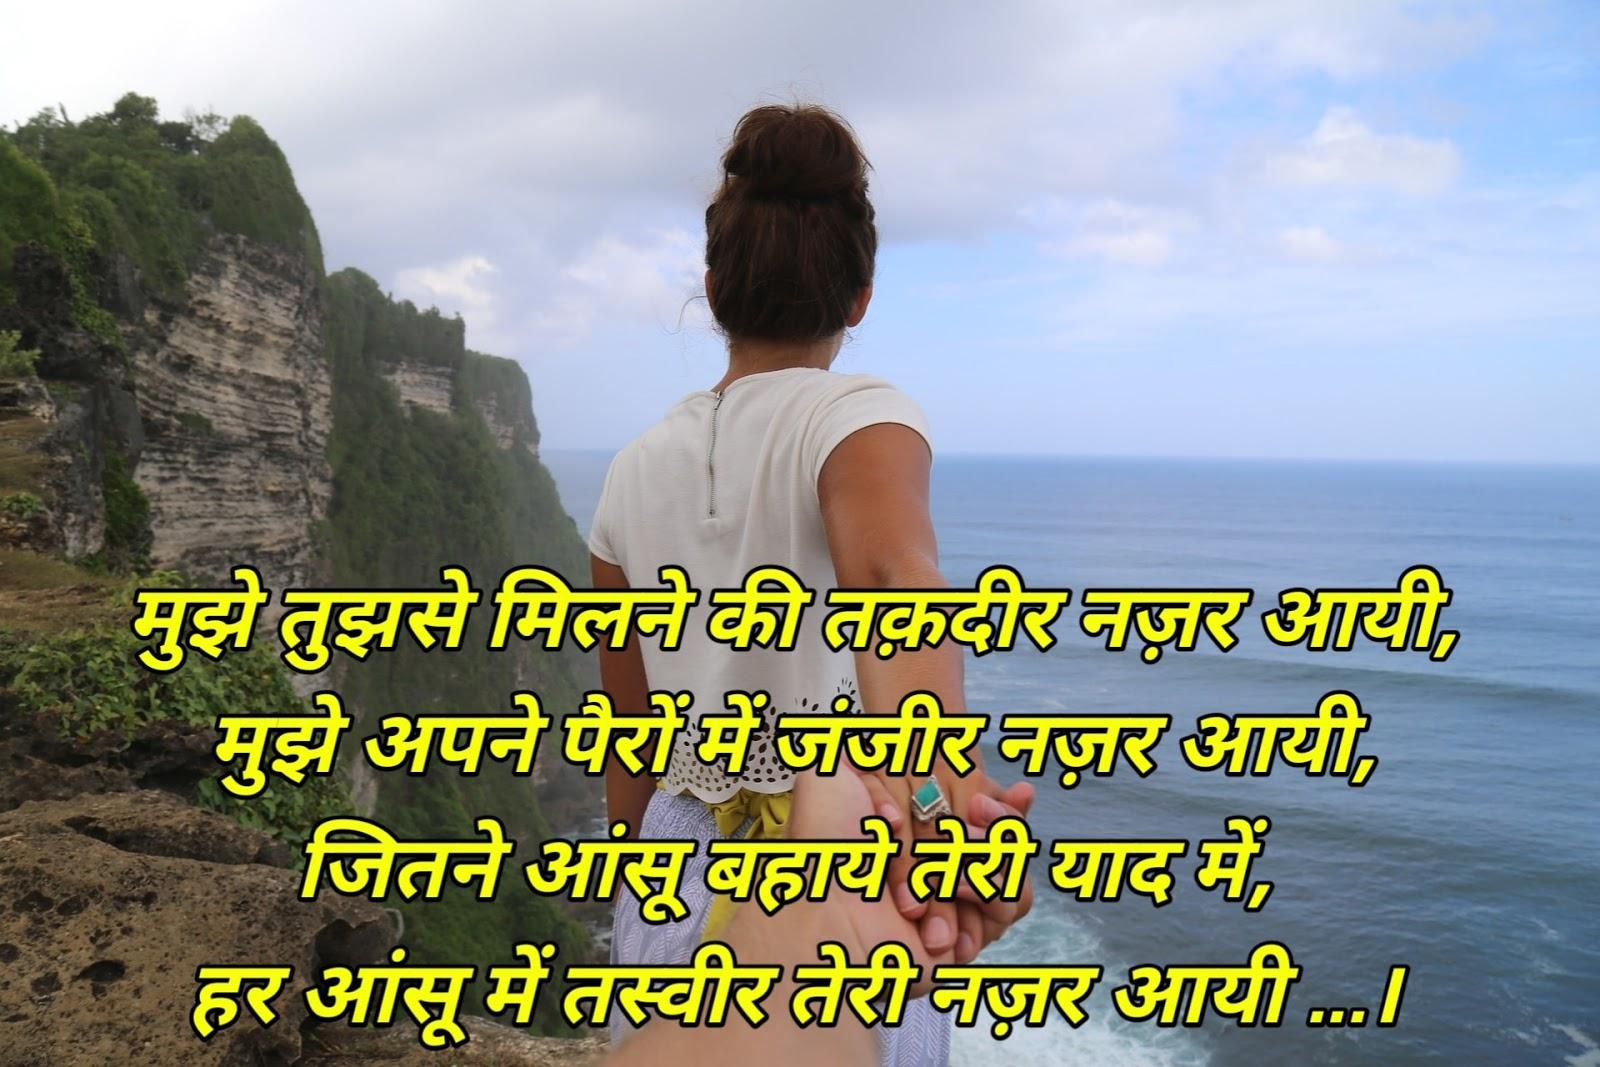 Sad love shayari that make you cry in Hindi